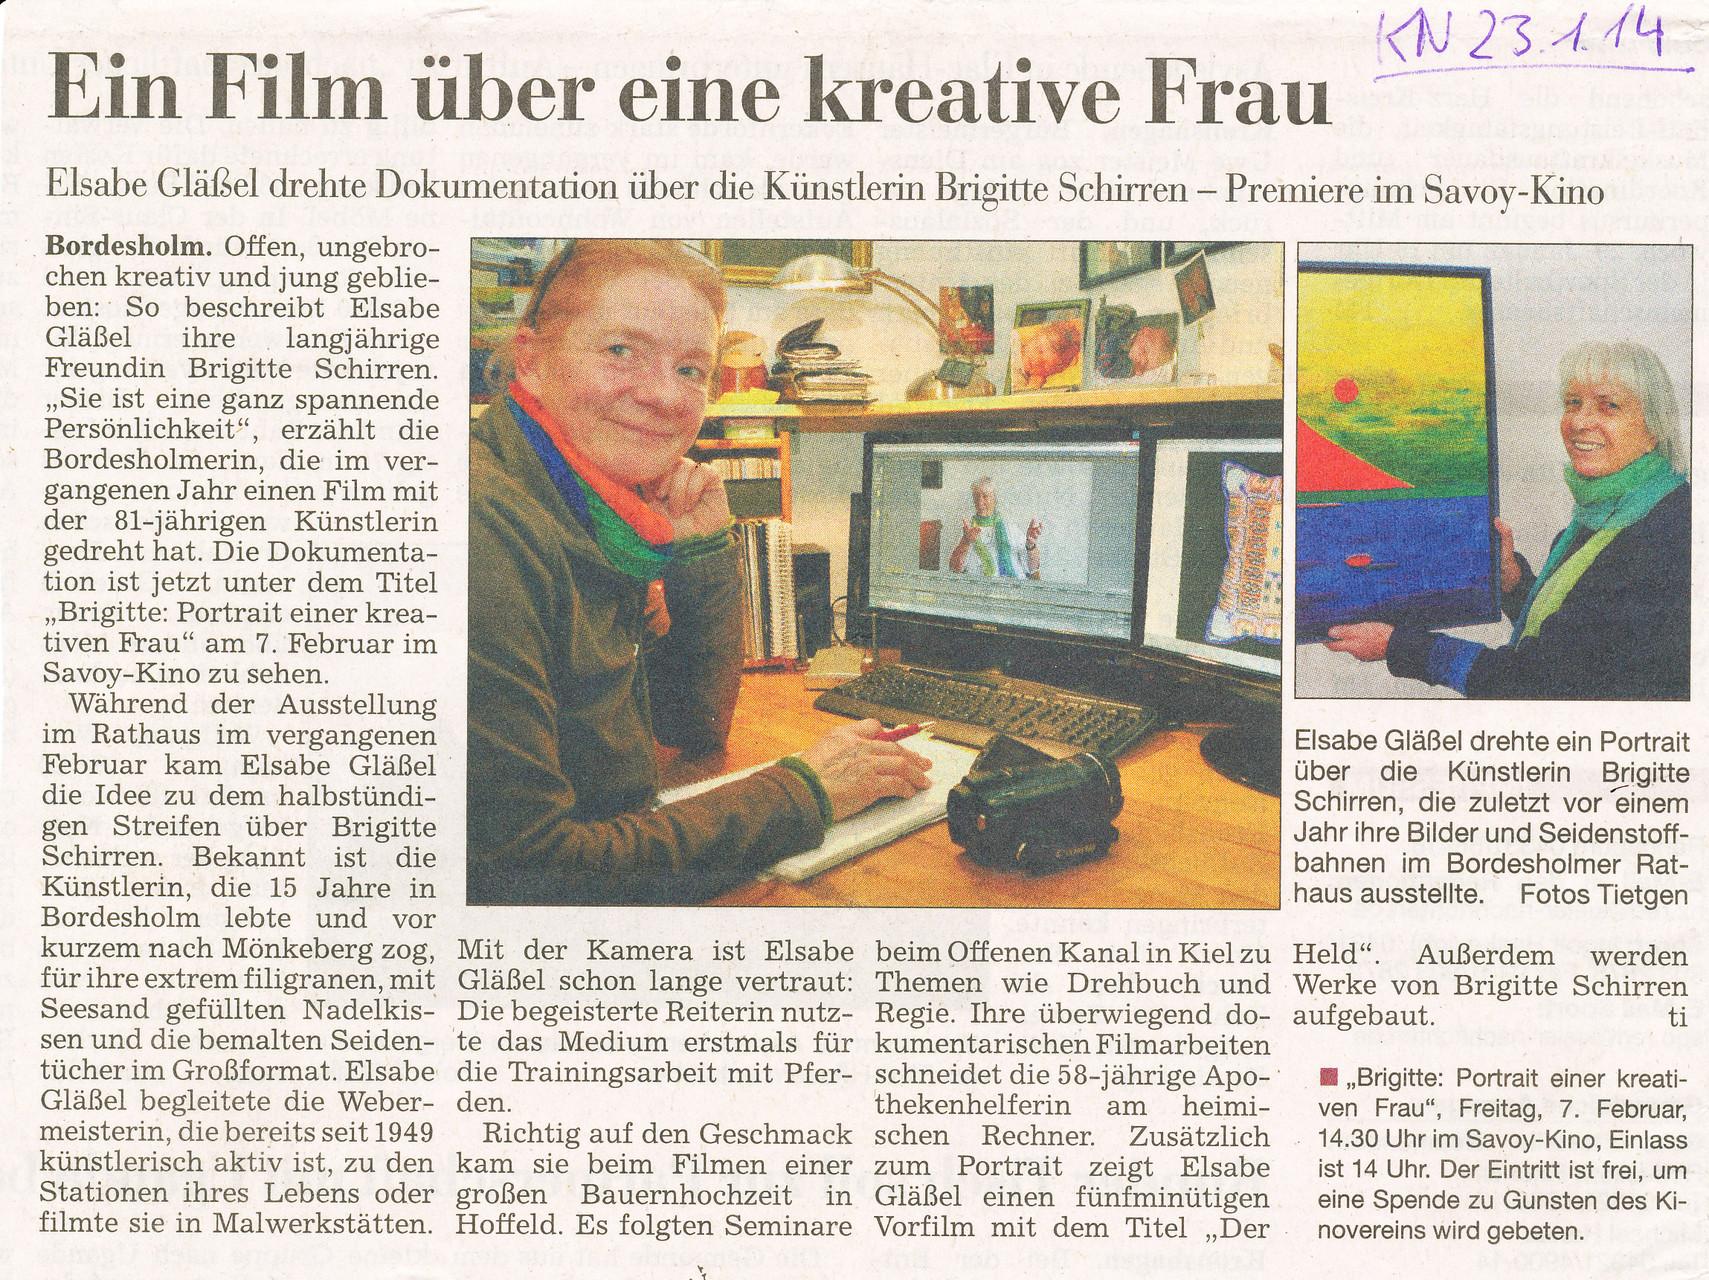 Kieler Nachrichten 23.1.2014